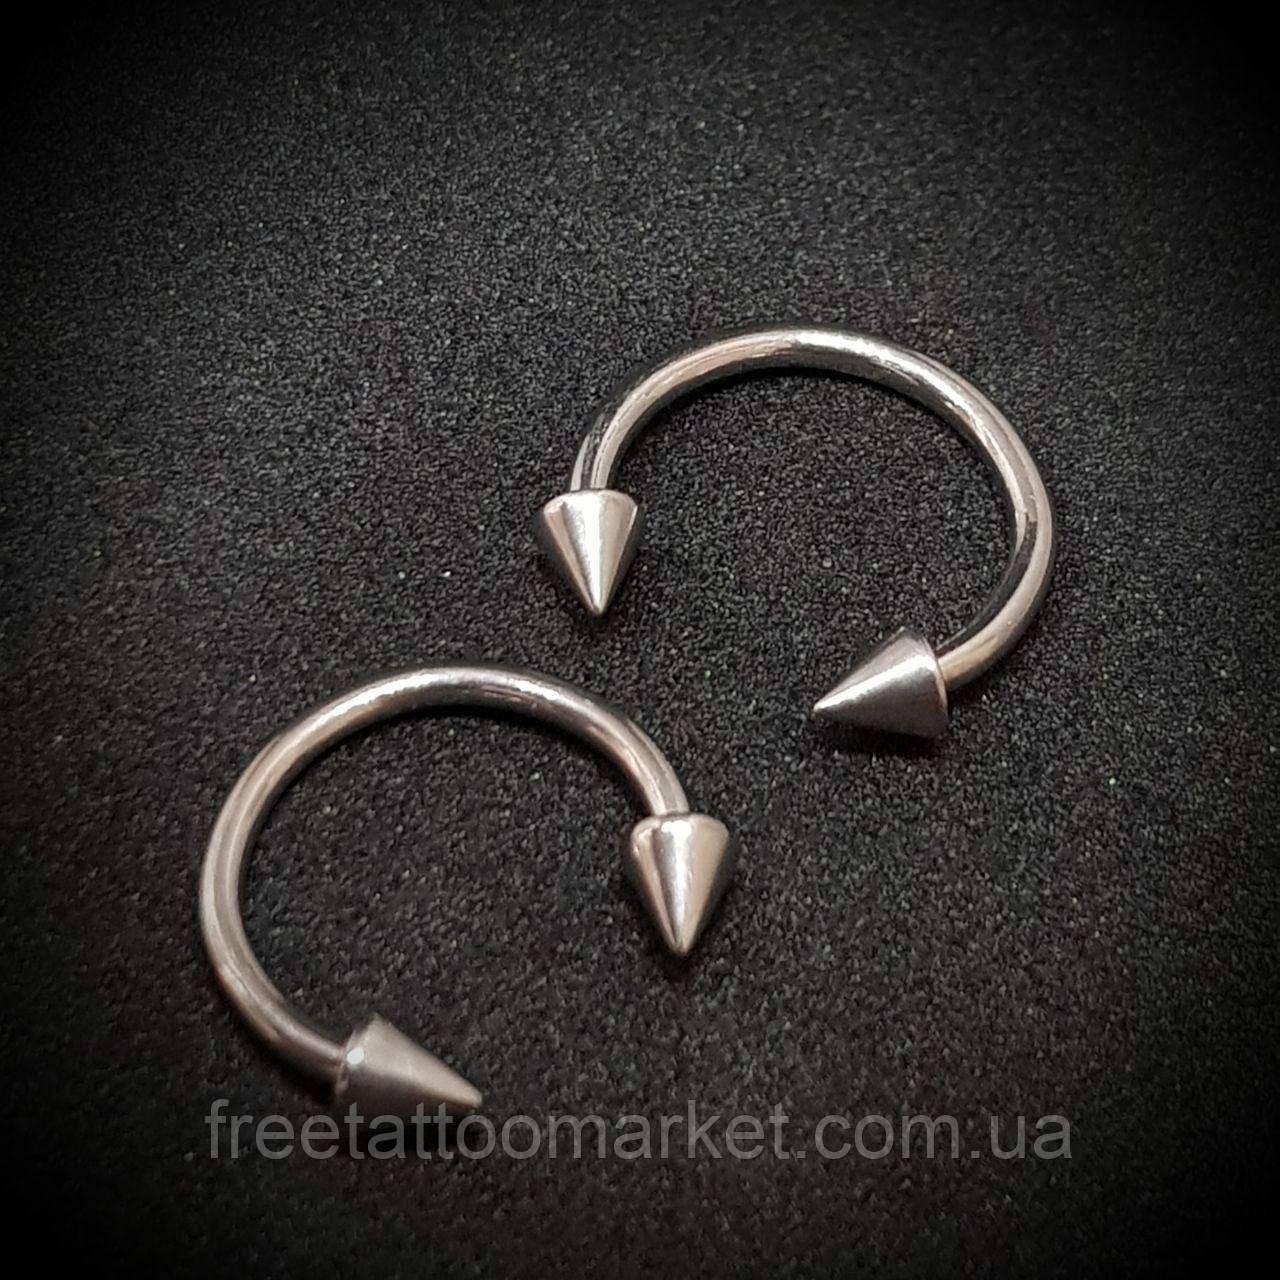 Полукольцо с конусами 1.2 х 10 х 3 мм (титан)